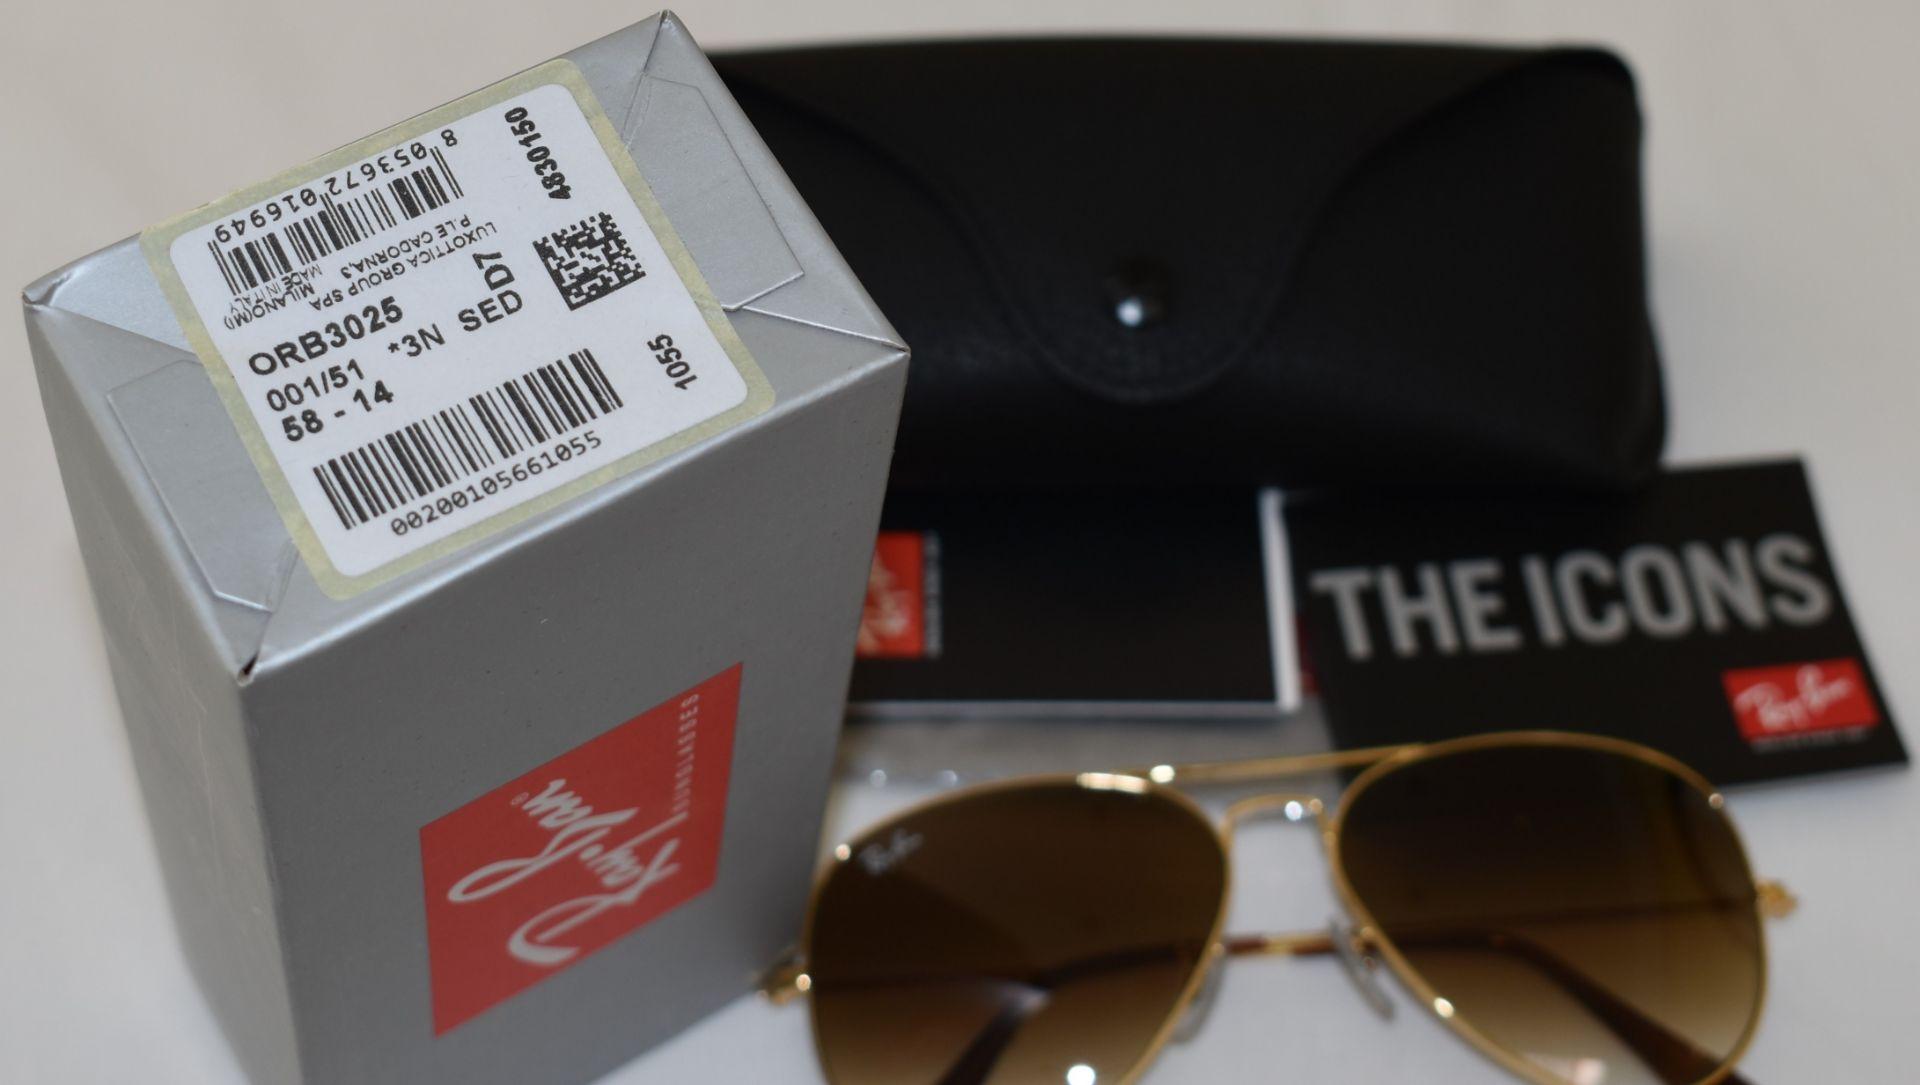 Ray Ban Sunglasses ORB3025 001/51 *3N - Image 2 of 2